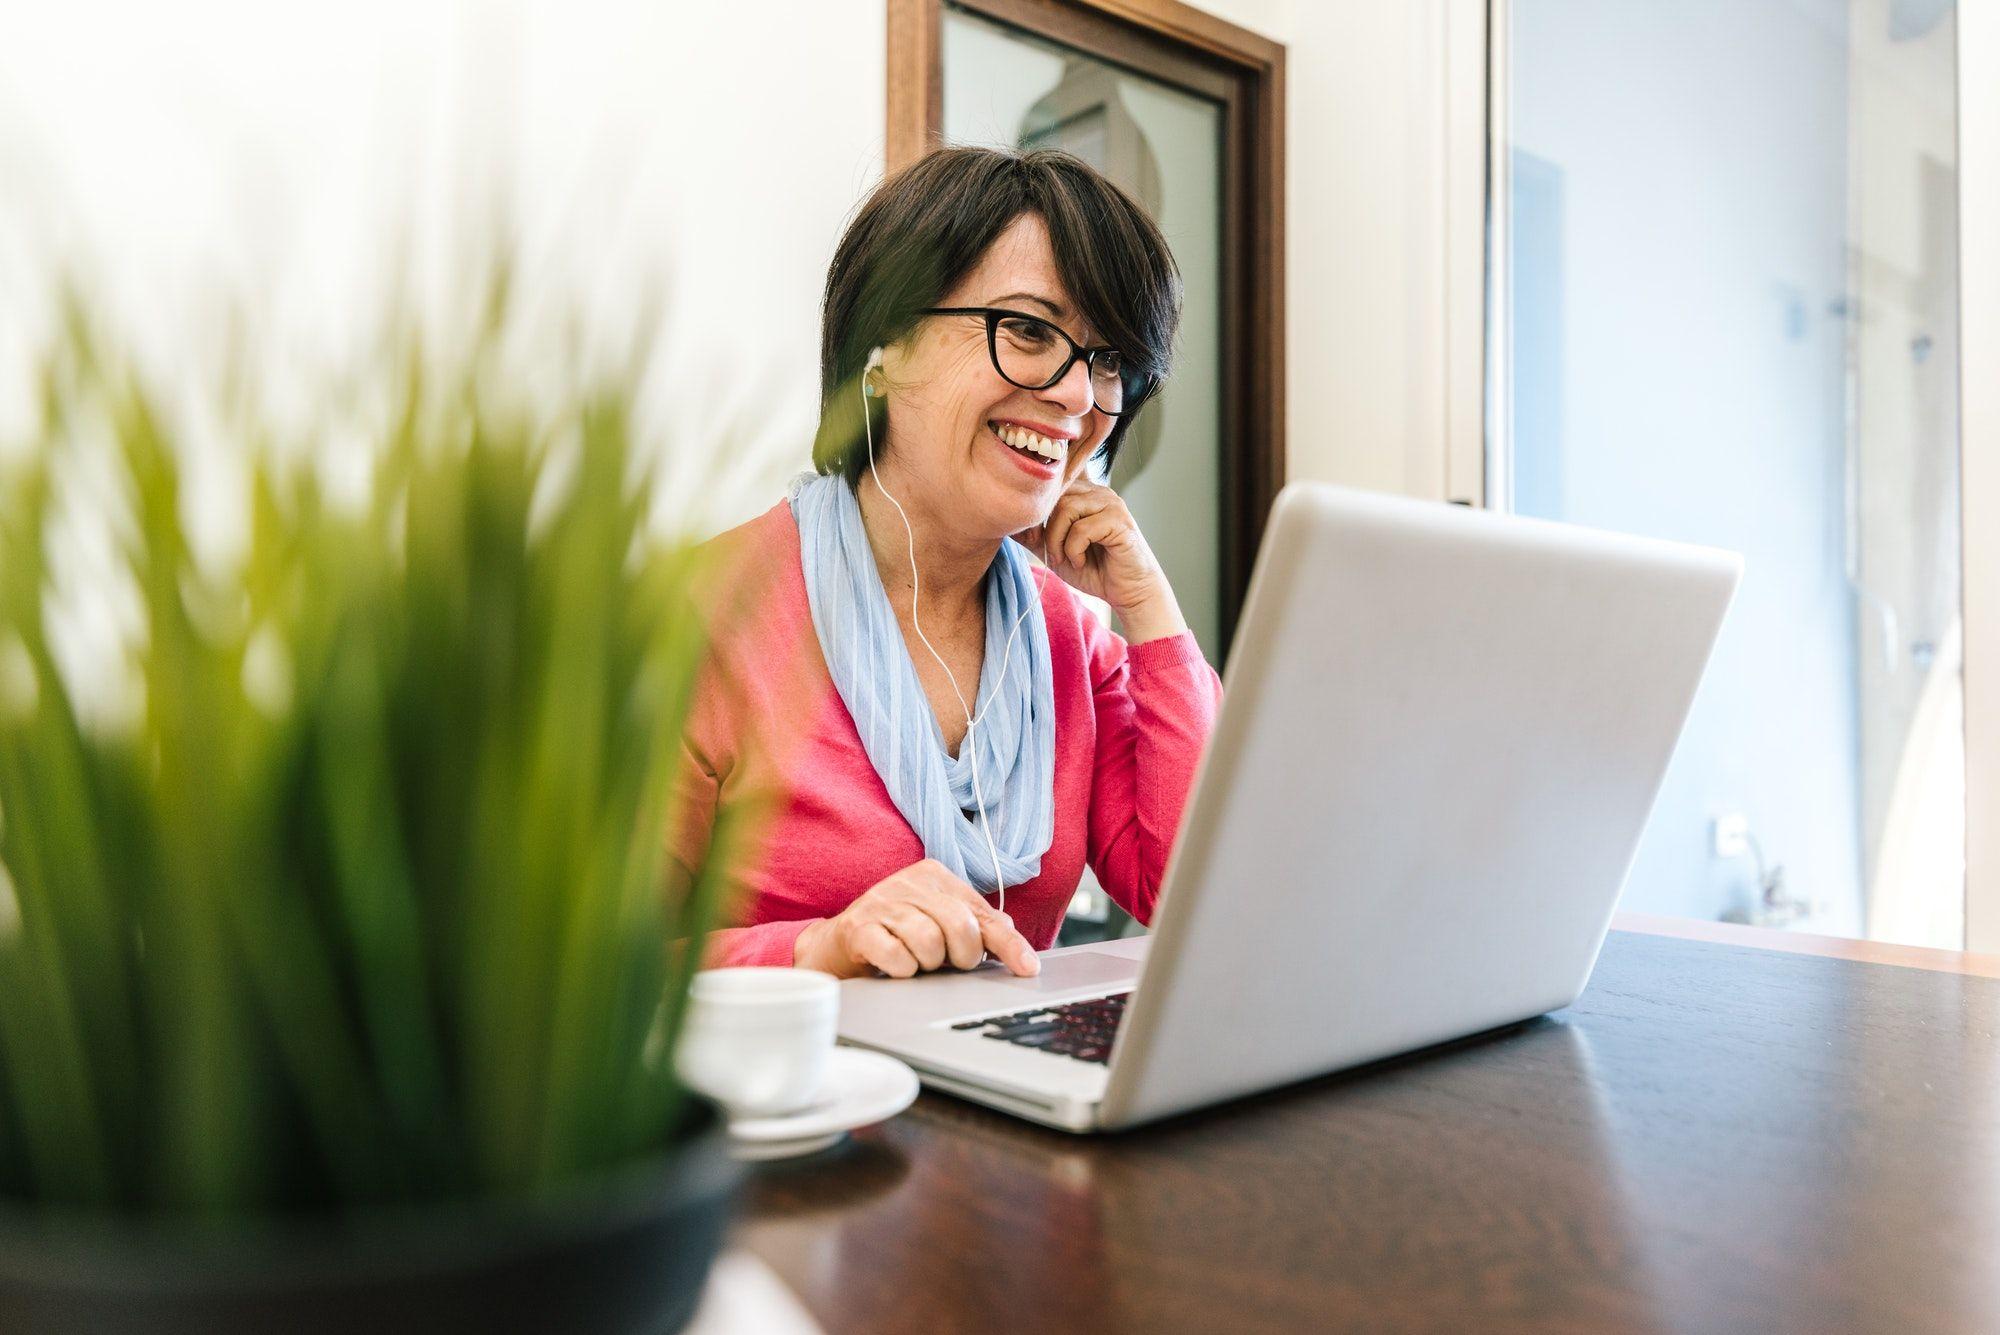 Mature woman using pc laptop indoor